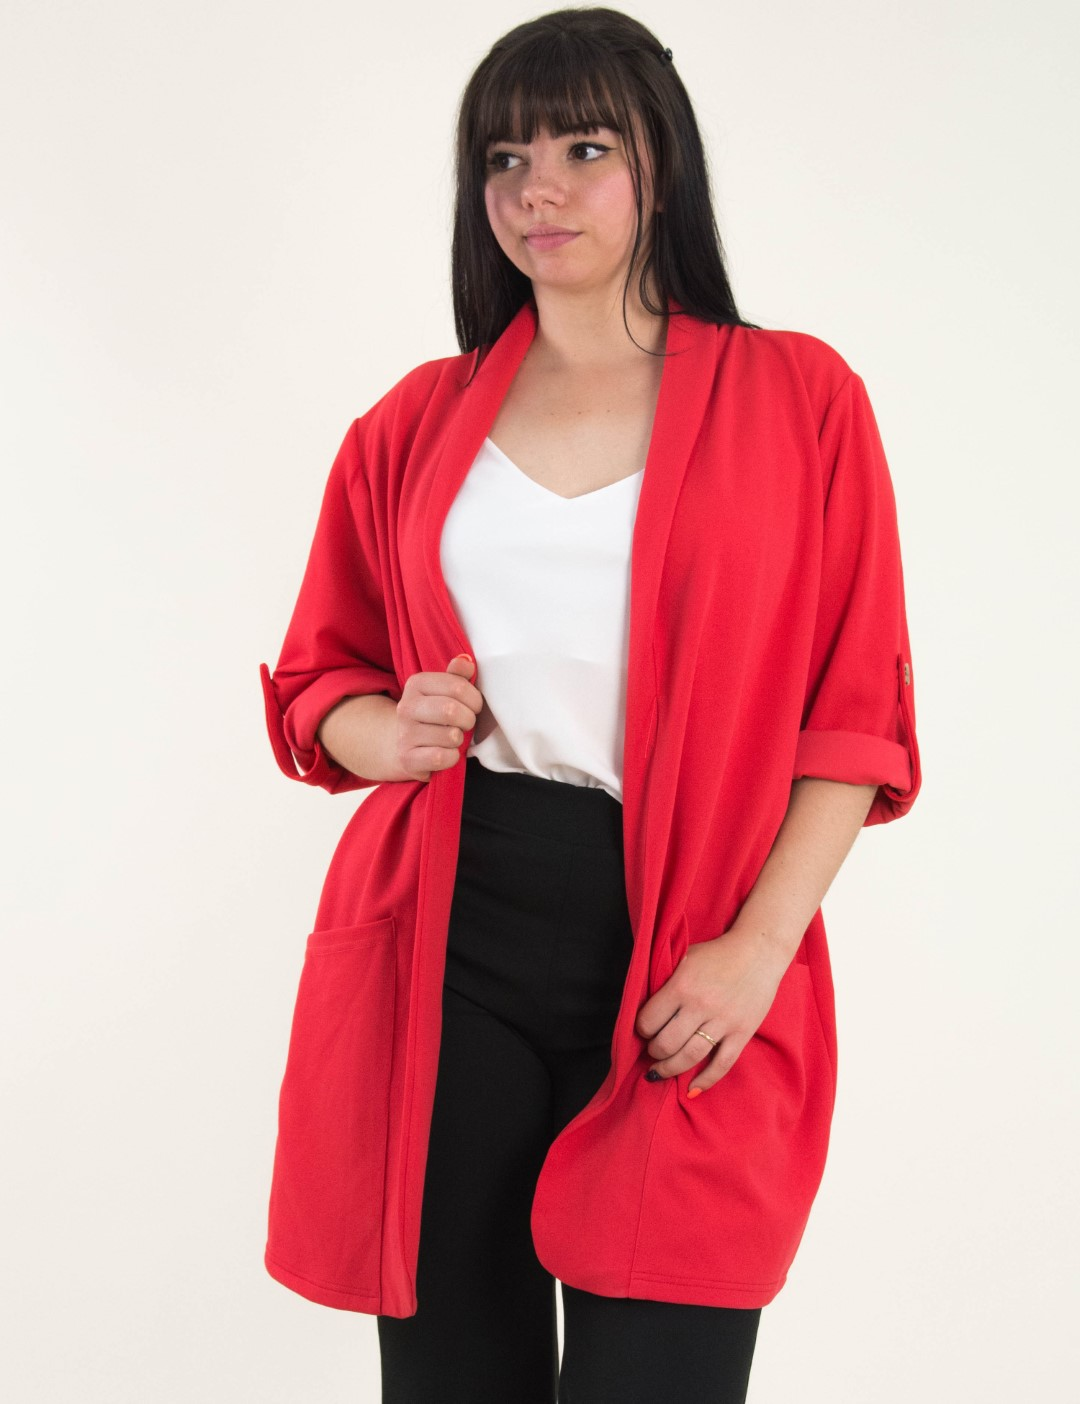 71579bc25ed9 Γυναικείο κόκκινο μονόχρωμο σακάκι Plus Size Honey 64923L